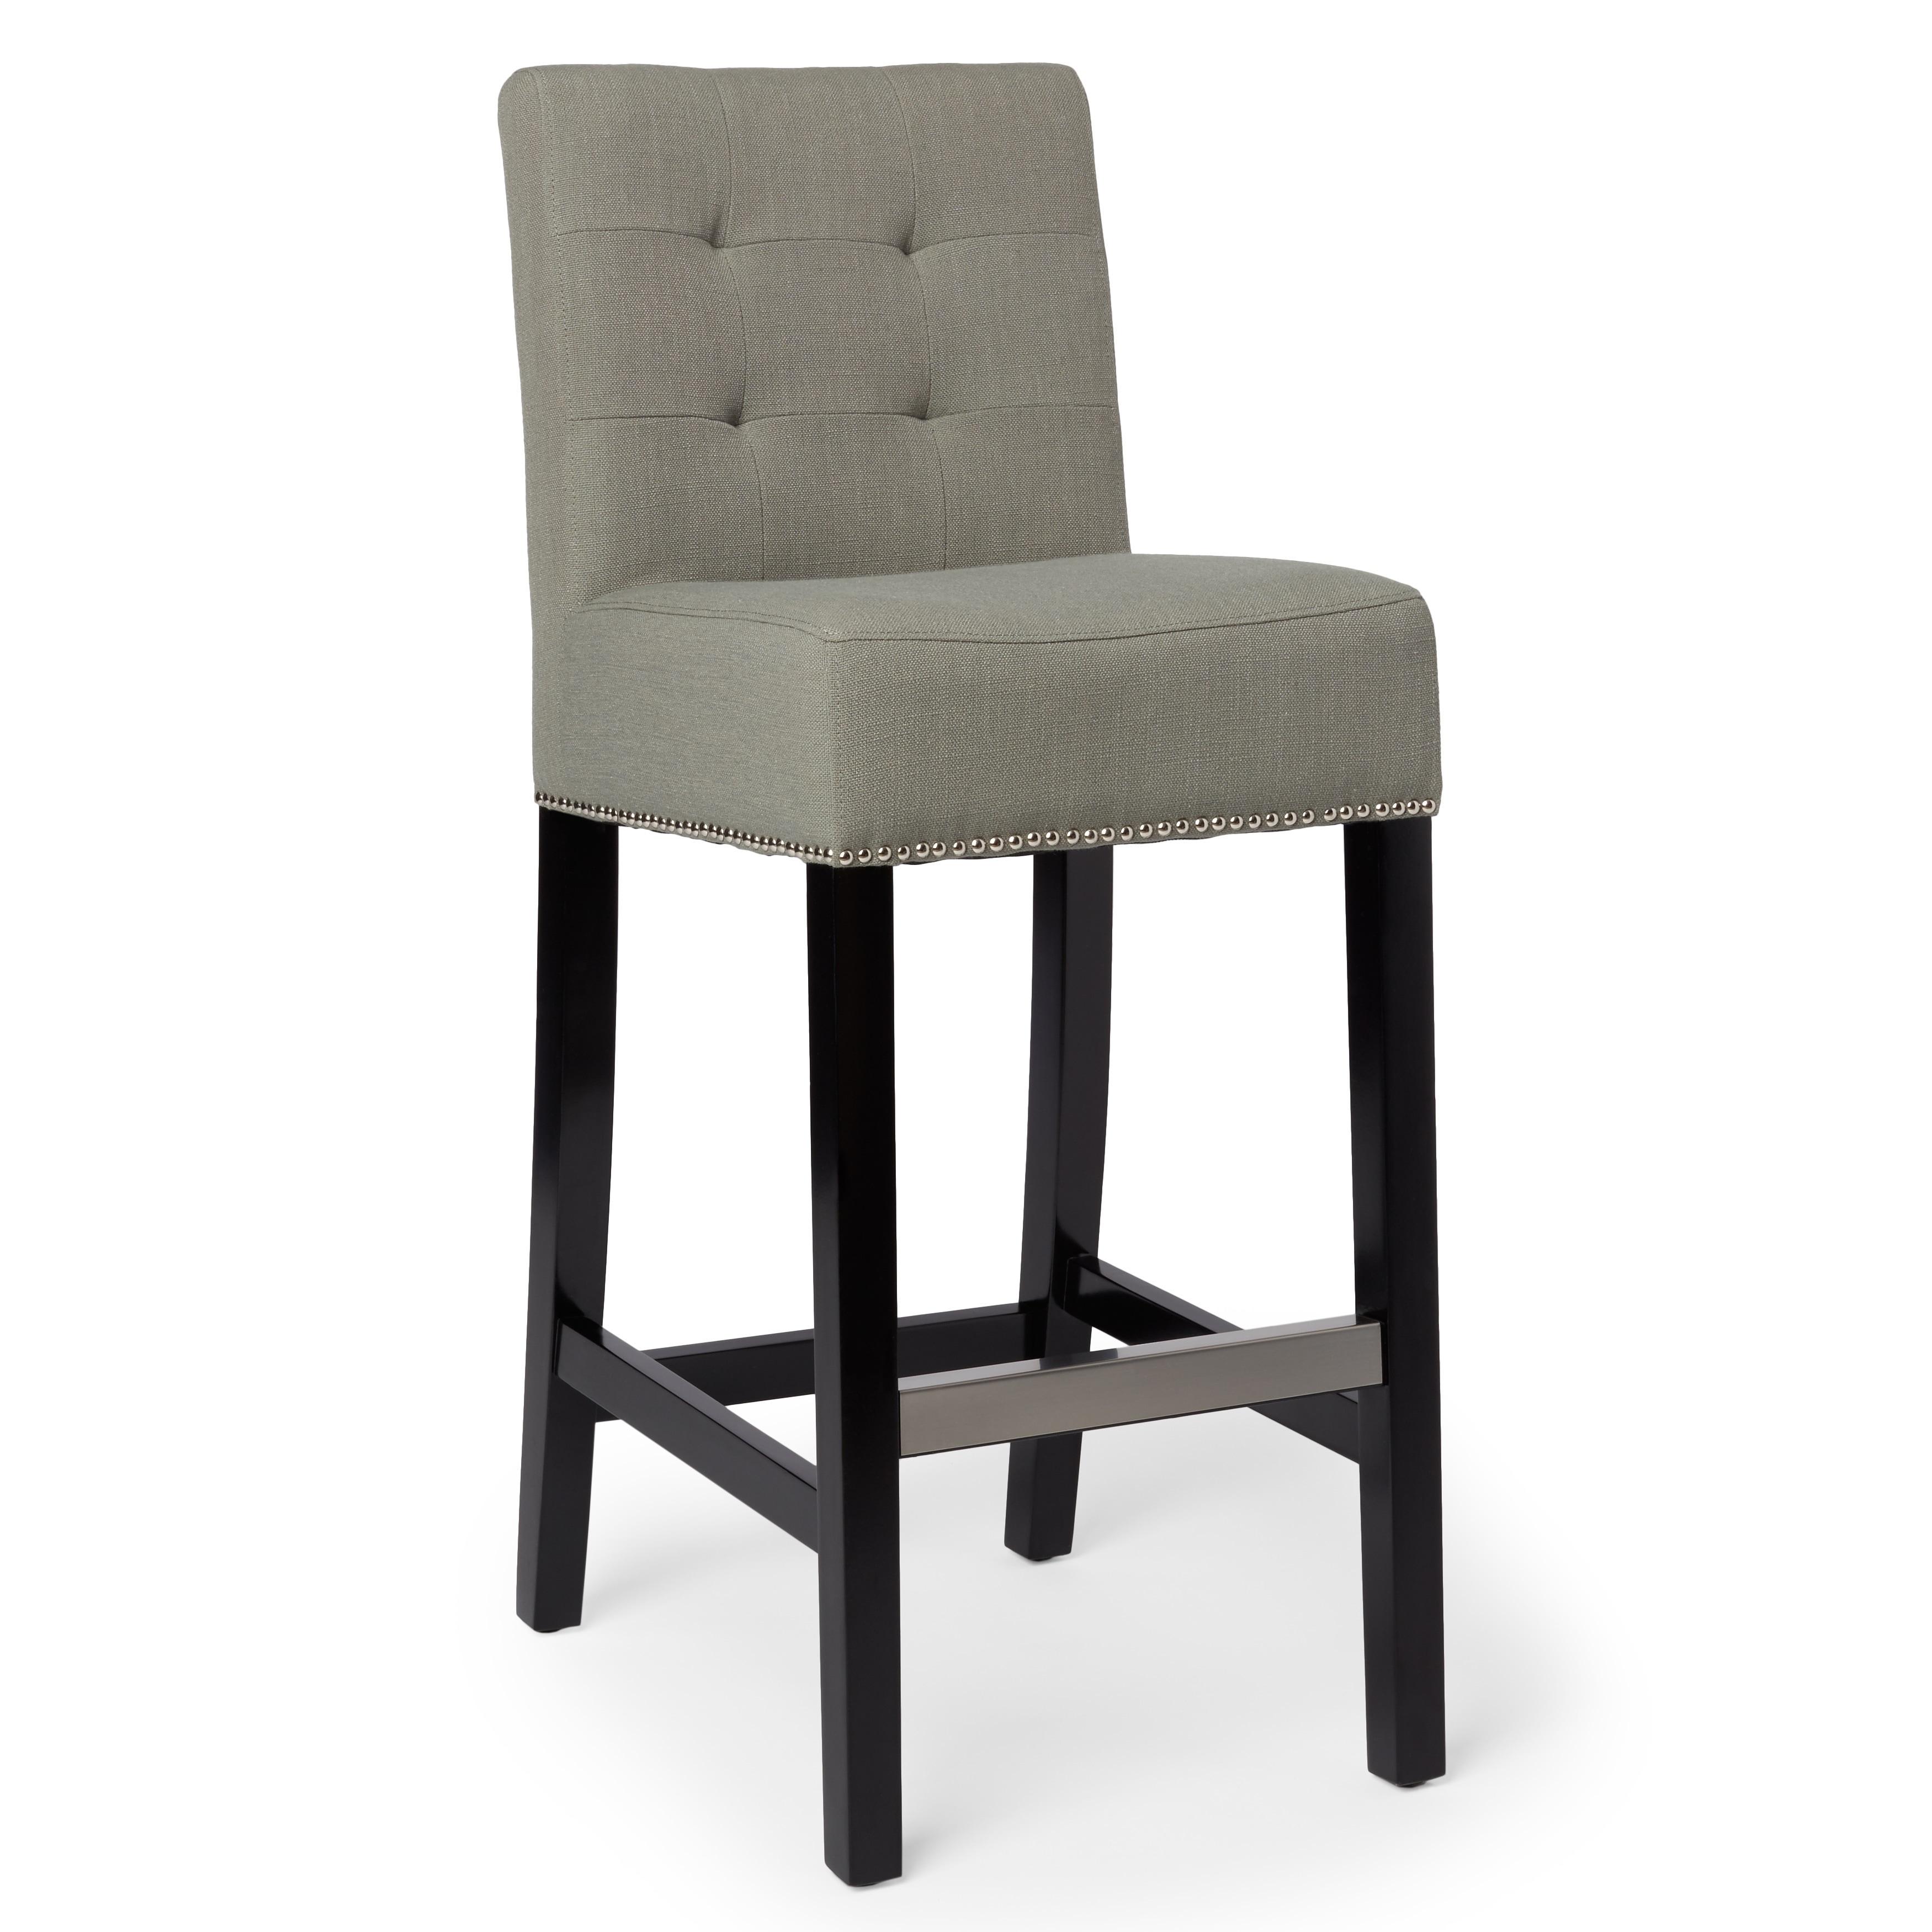 Enjoyable Abbyson Masimo 30 Inch Grey Linen Bar Stool Inzonedesignstudio Interior Chair Design Inzonedesignstudiocom